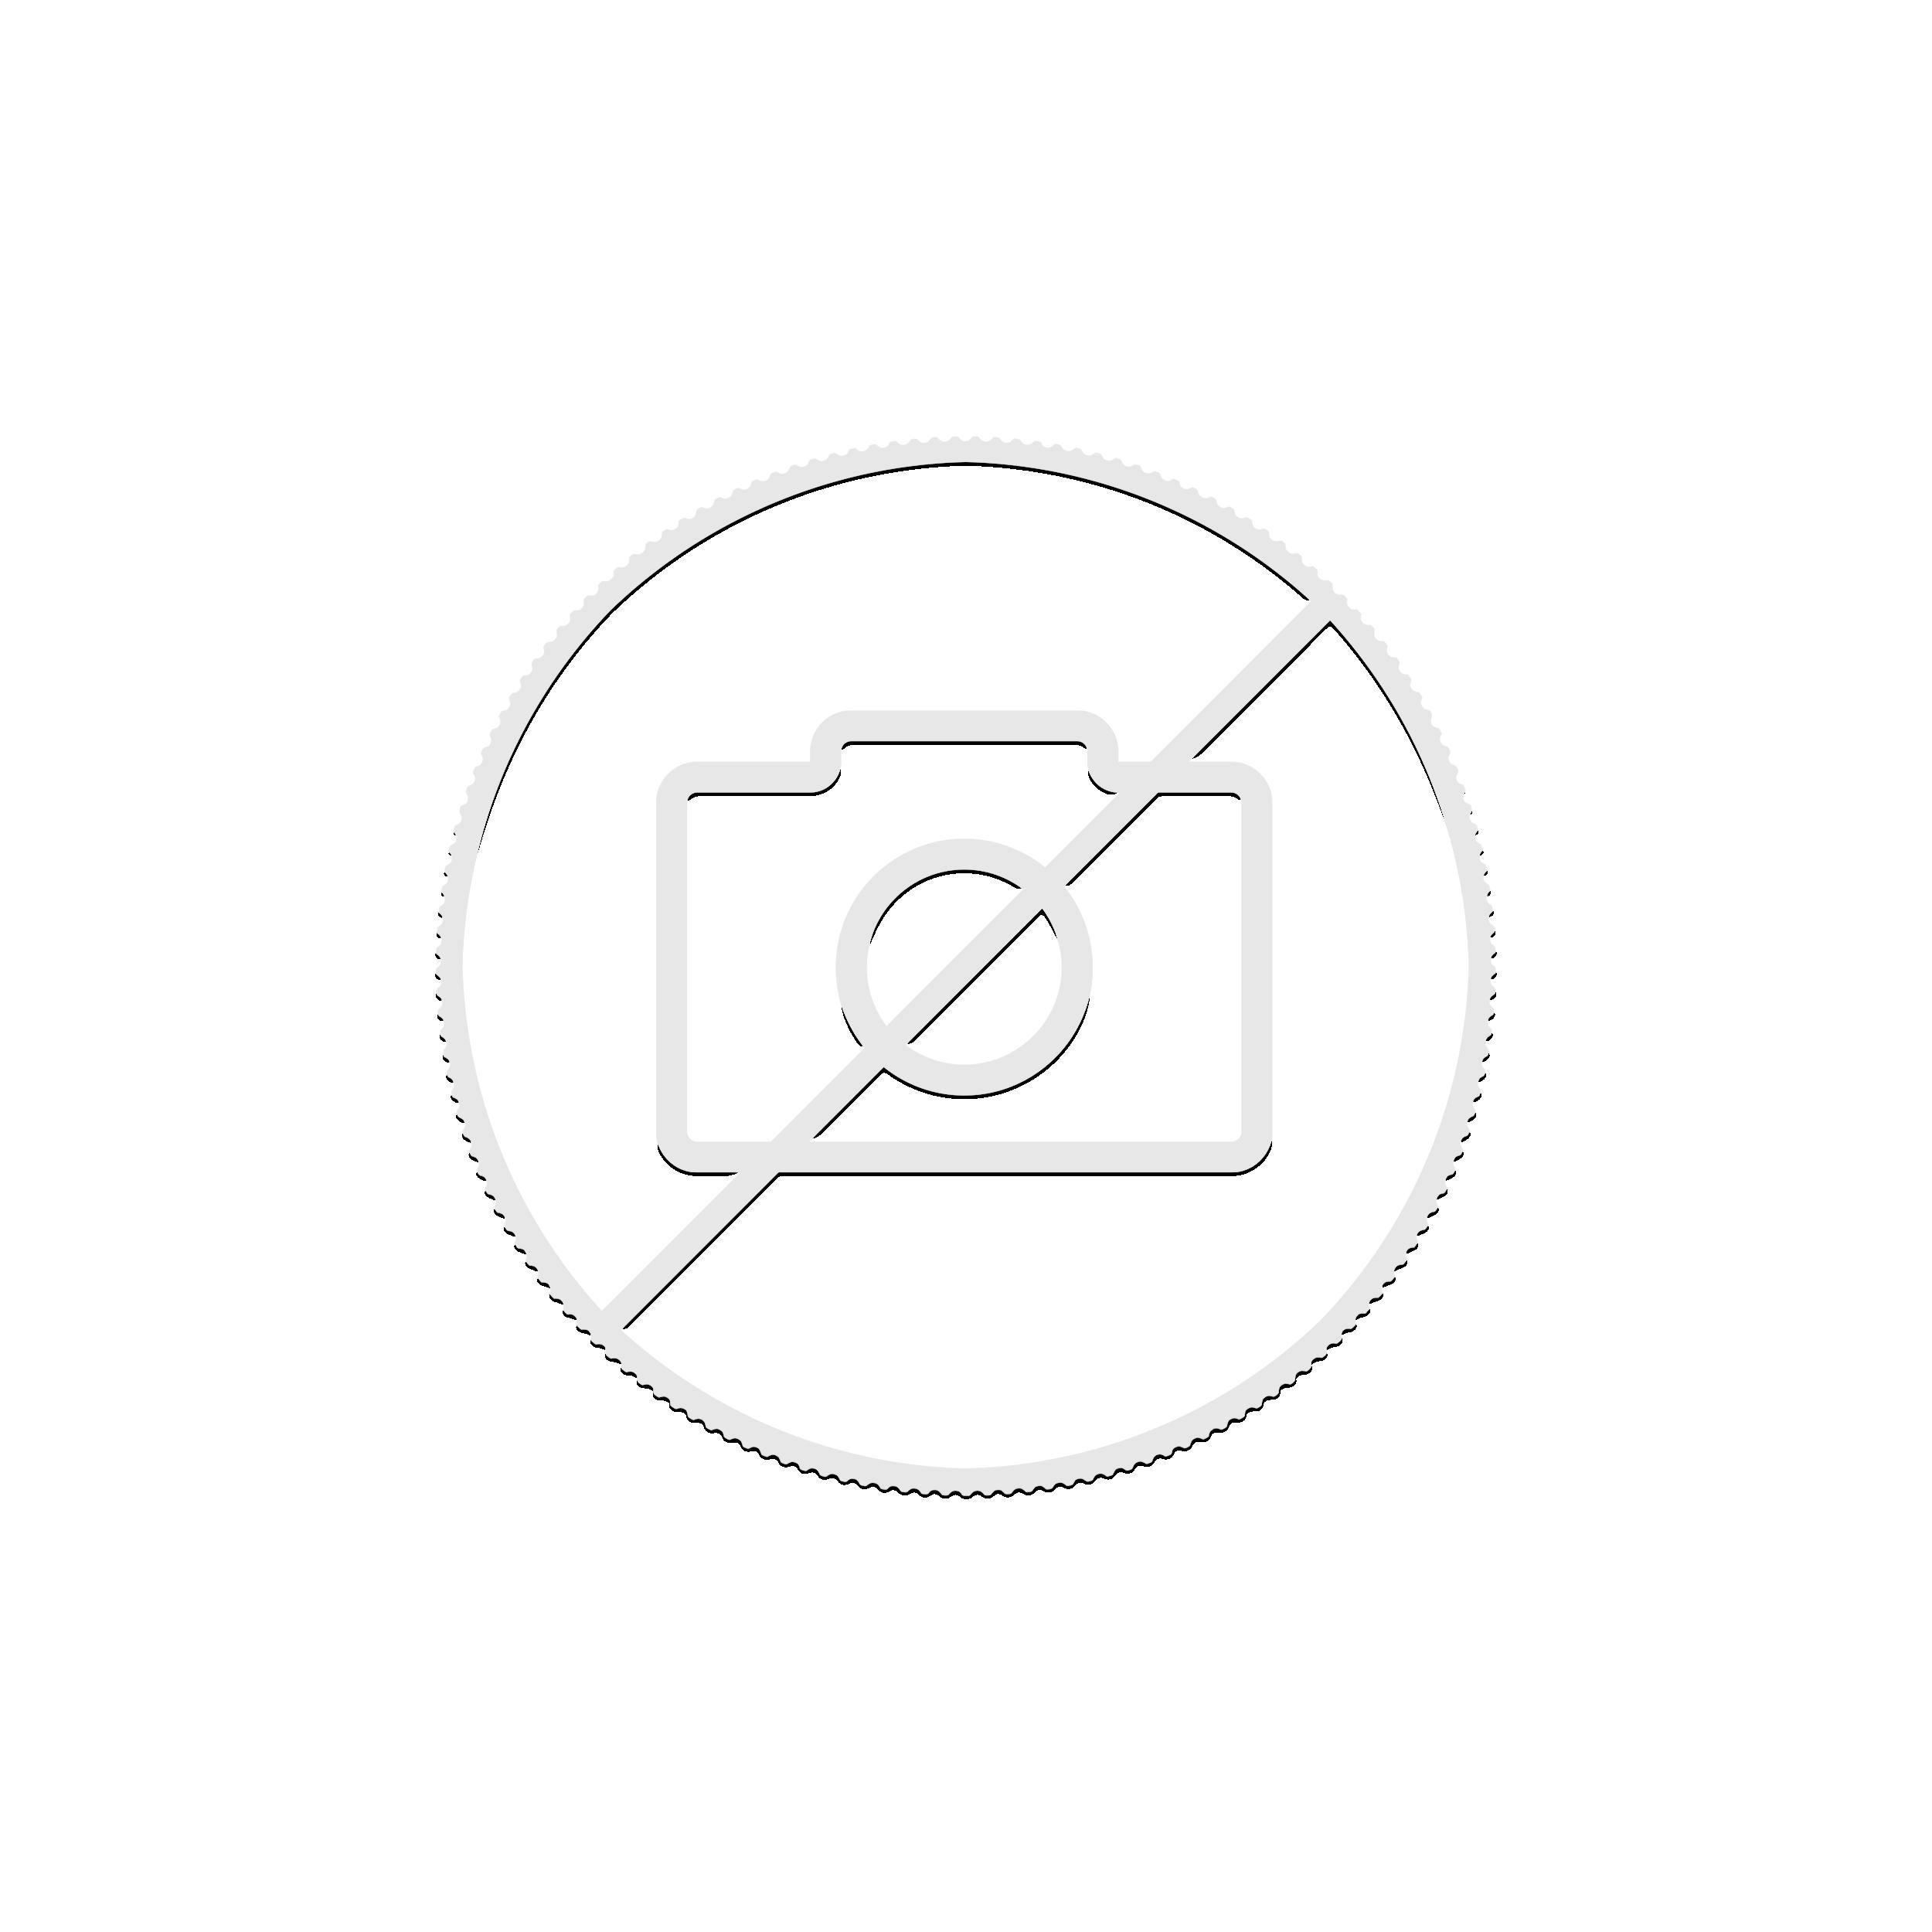 1/10 troy ounce gold Krugerrand coin